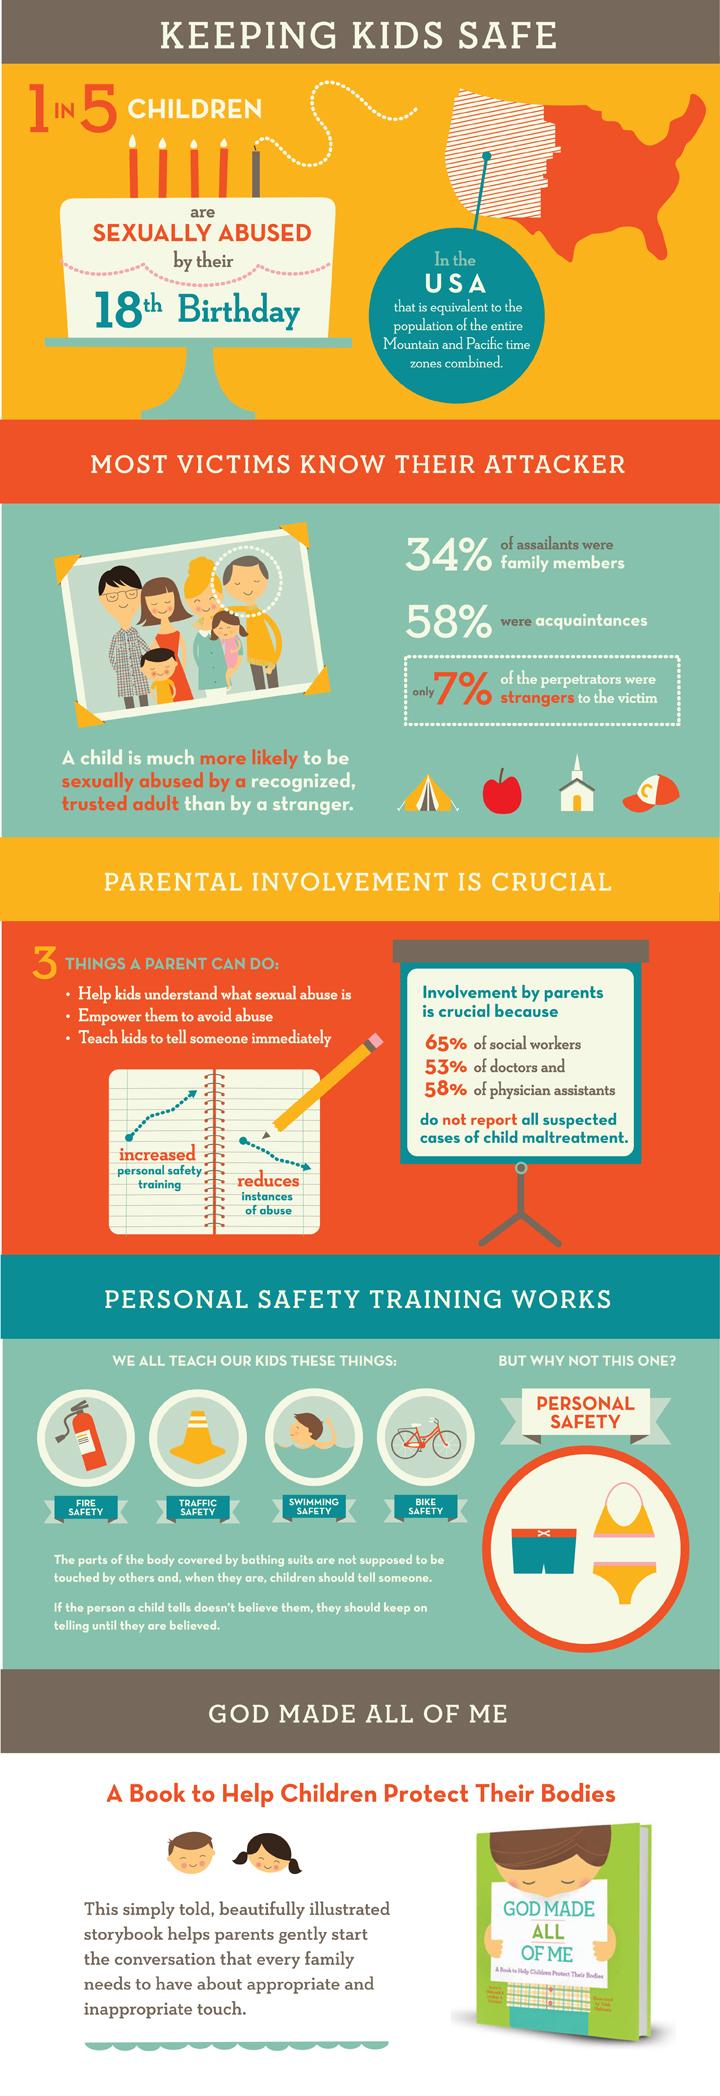 GMAOM Infographic lg